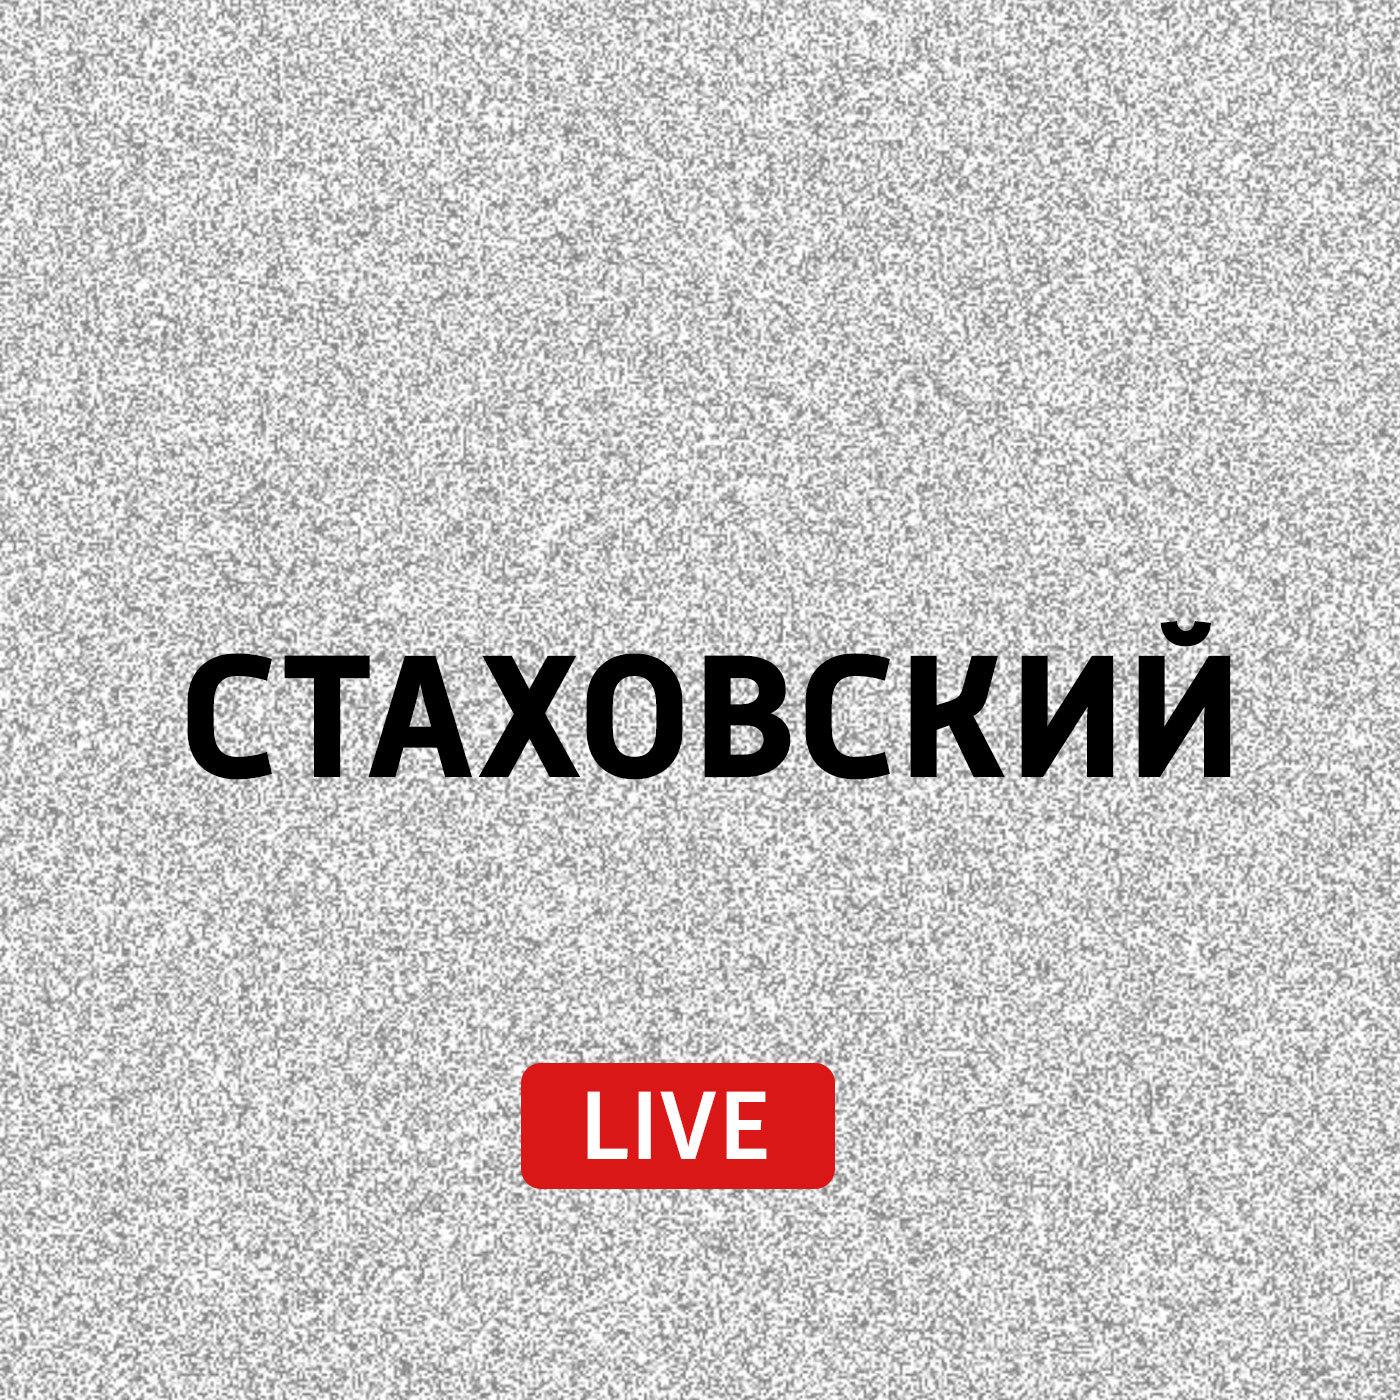 Евгений Стаховский Об опере «Евгений Онегин